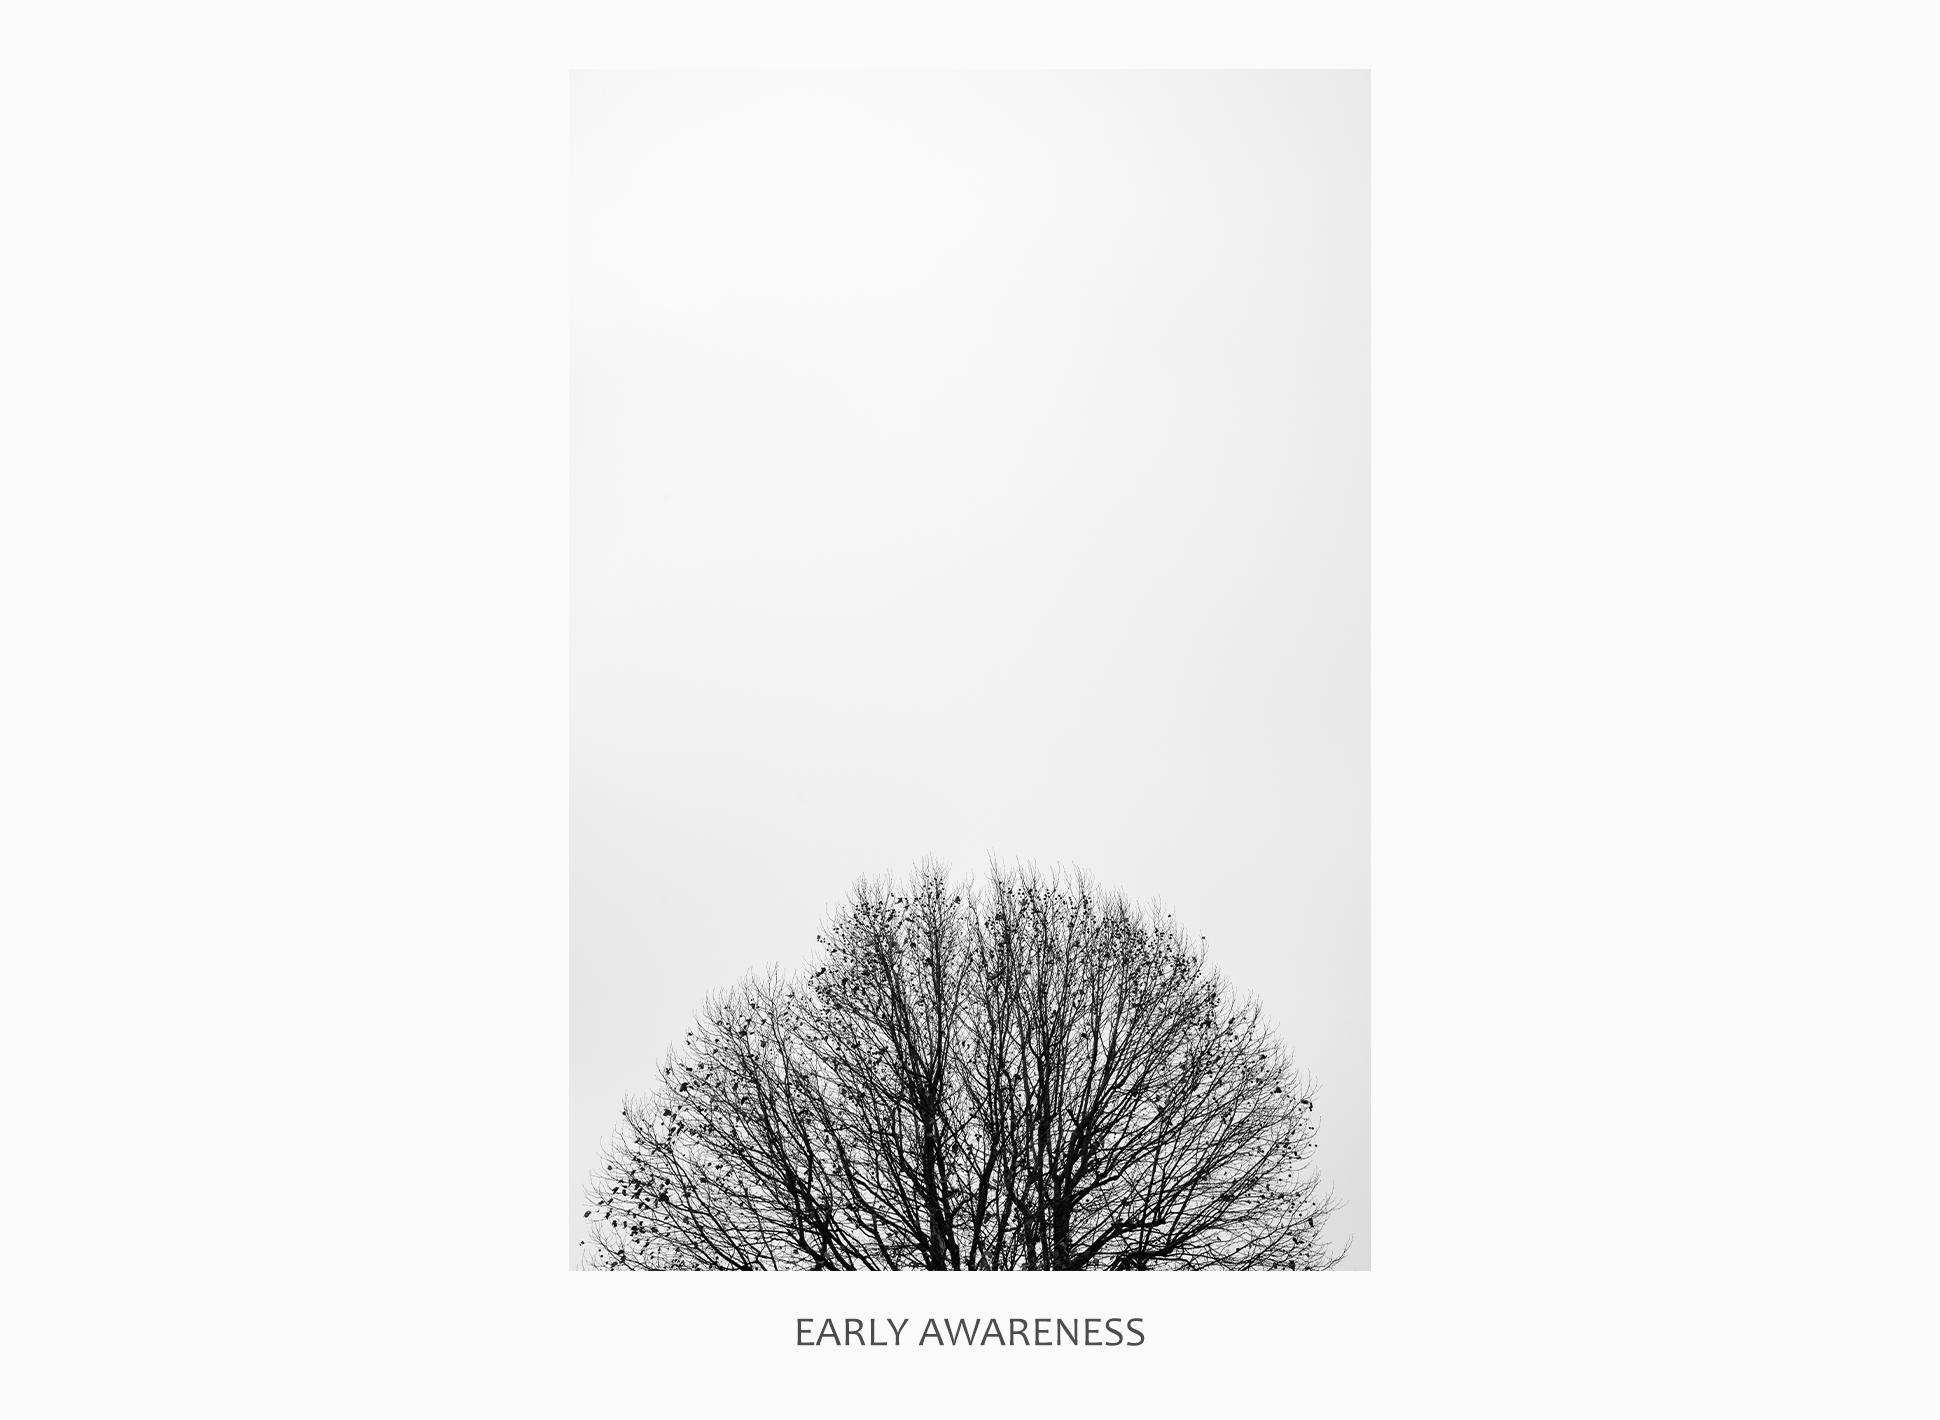 08 43686 - Early Awareness